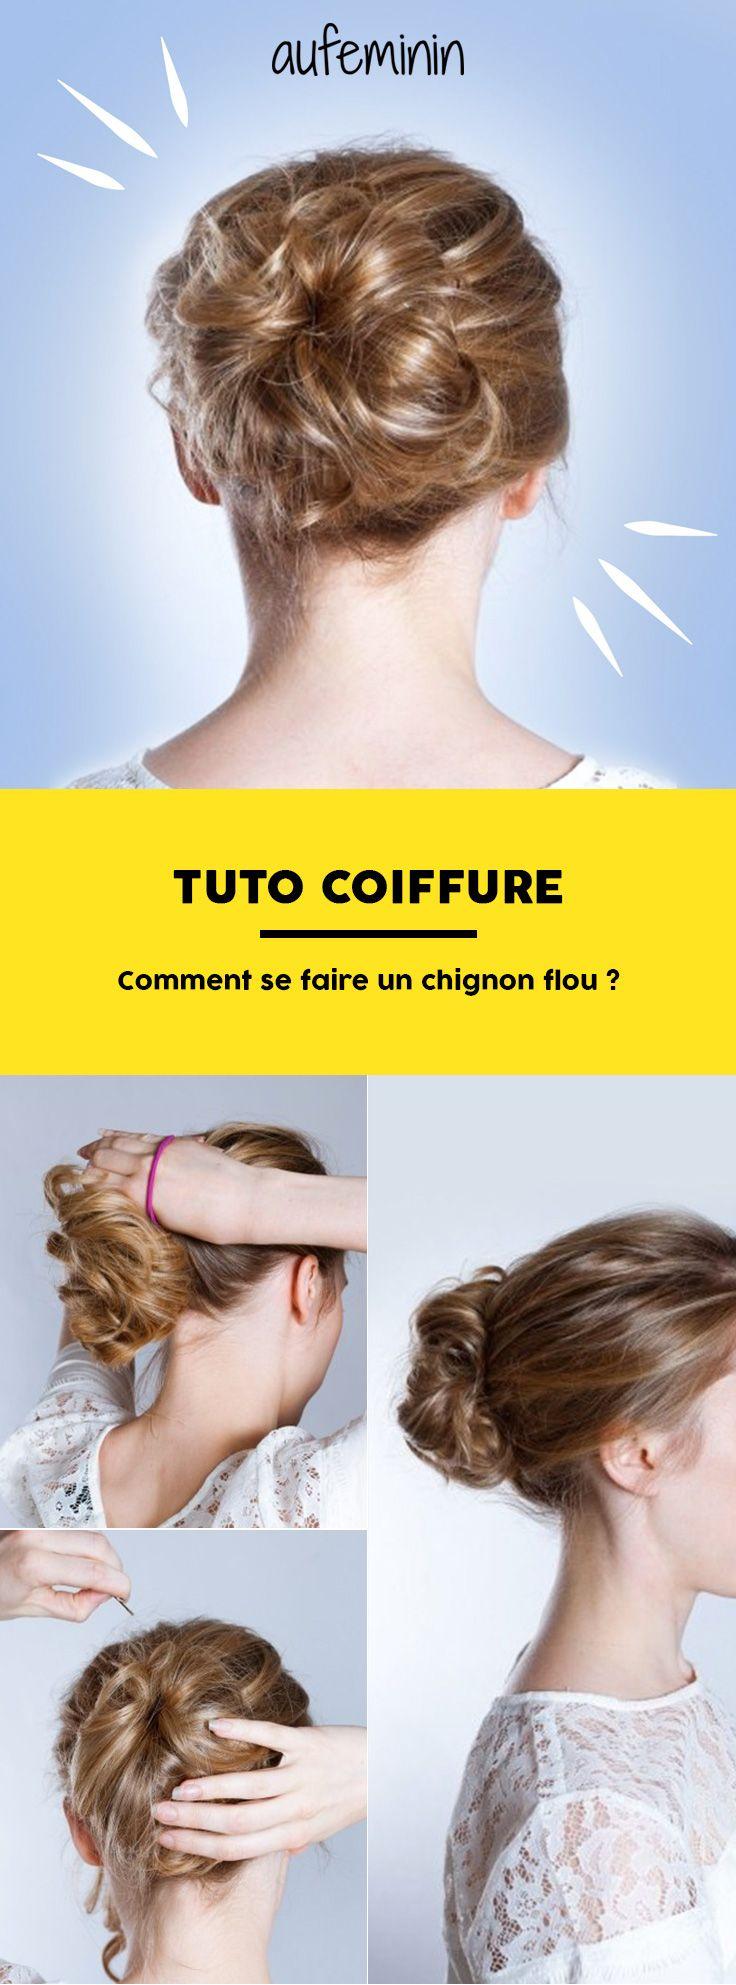 Comment se faire un chignon flou ? (Tuto coiffure) | bio | Chignon flou tuto, Tuto coiffure ...